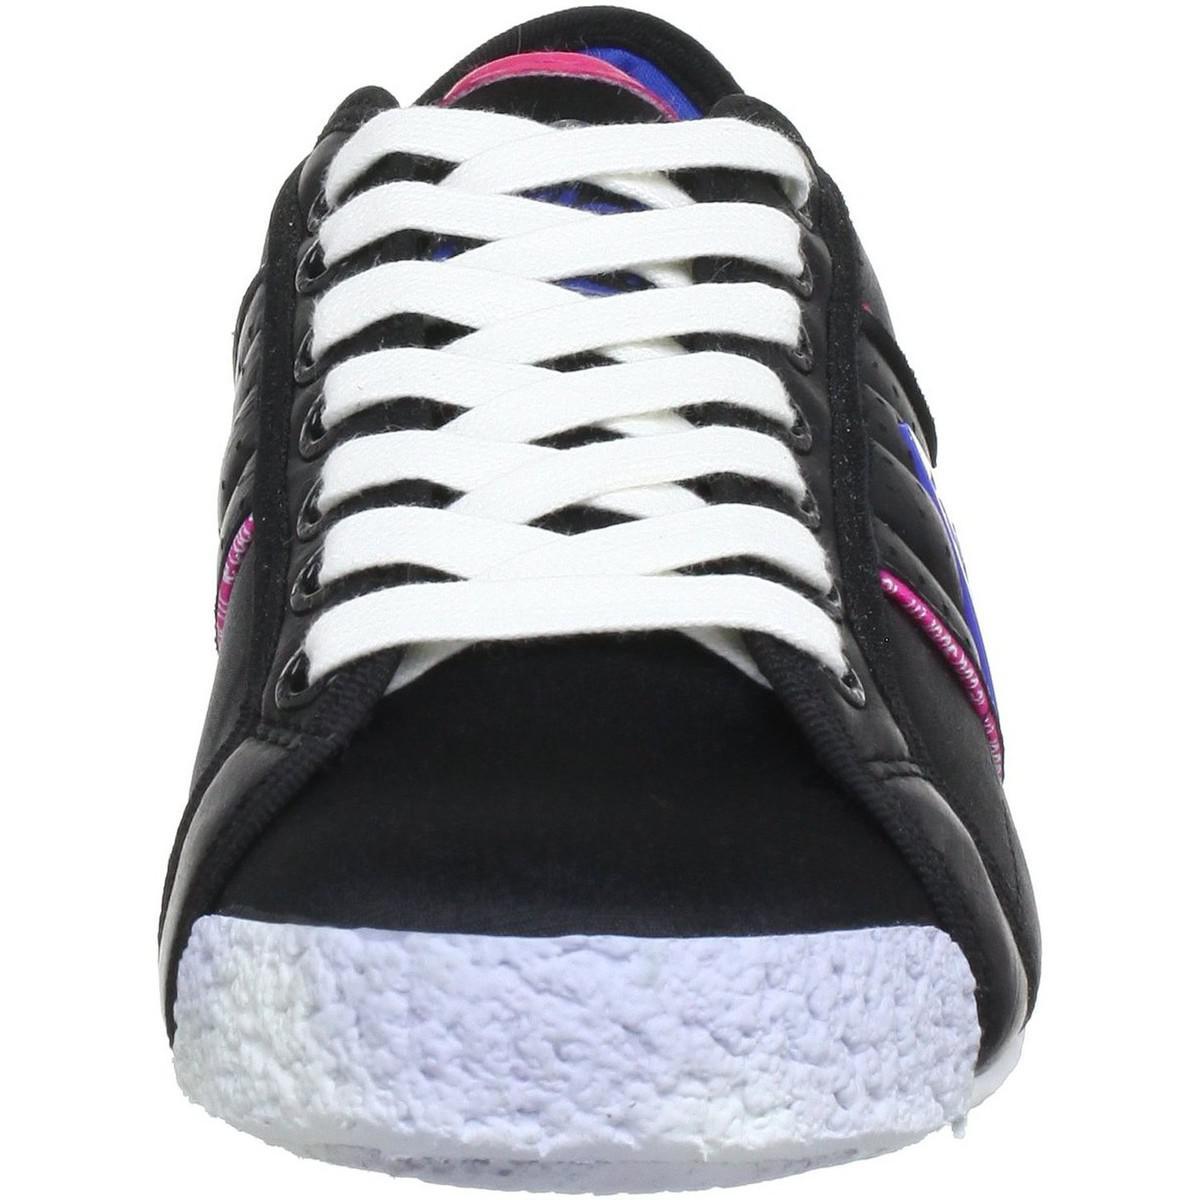 Le Coq Sportif Escrime Neoprene Women's Shoes (trainers) In Black